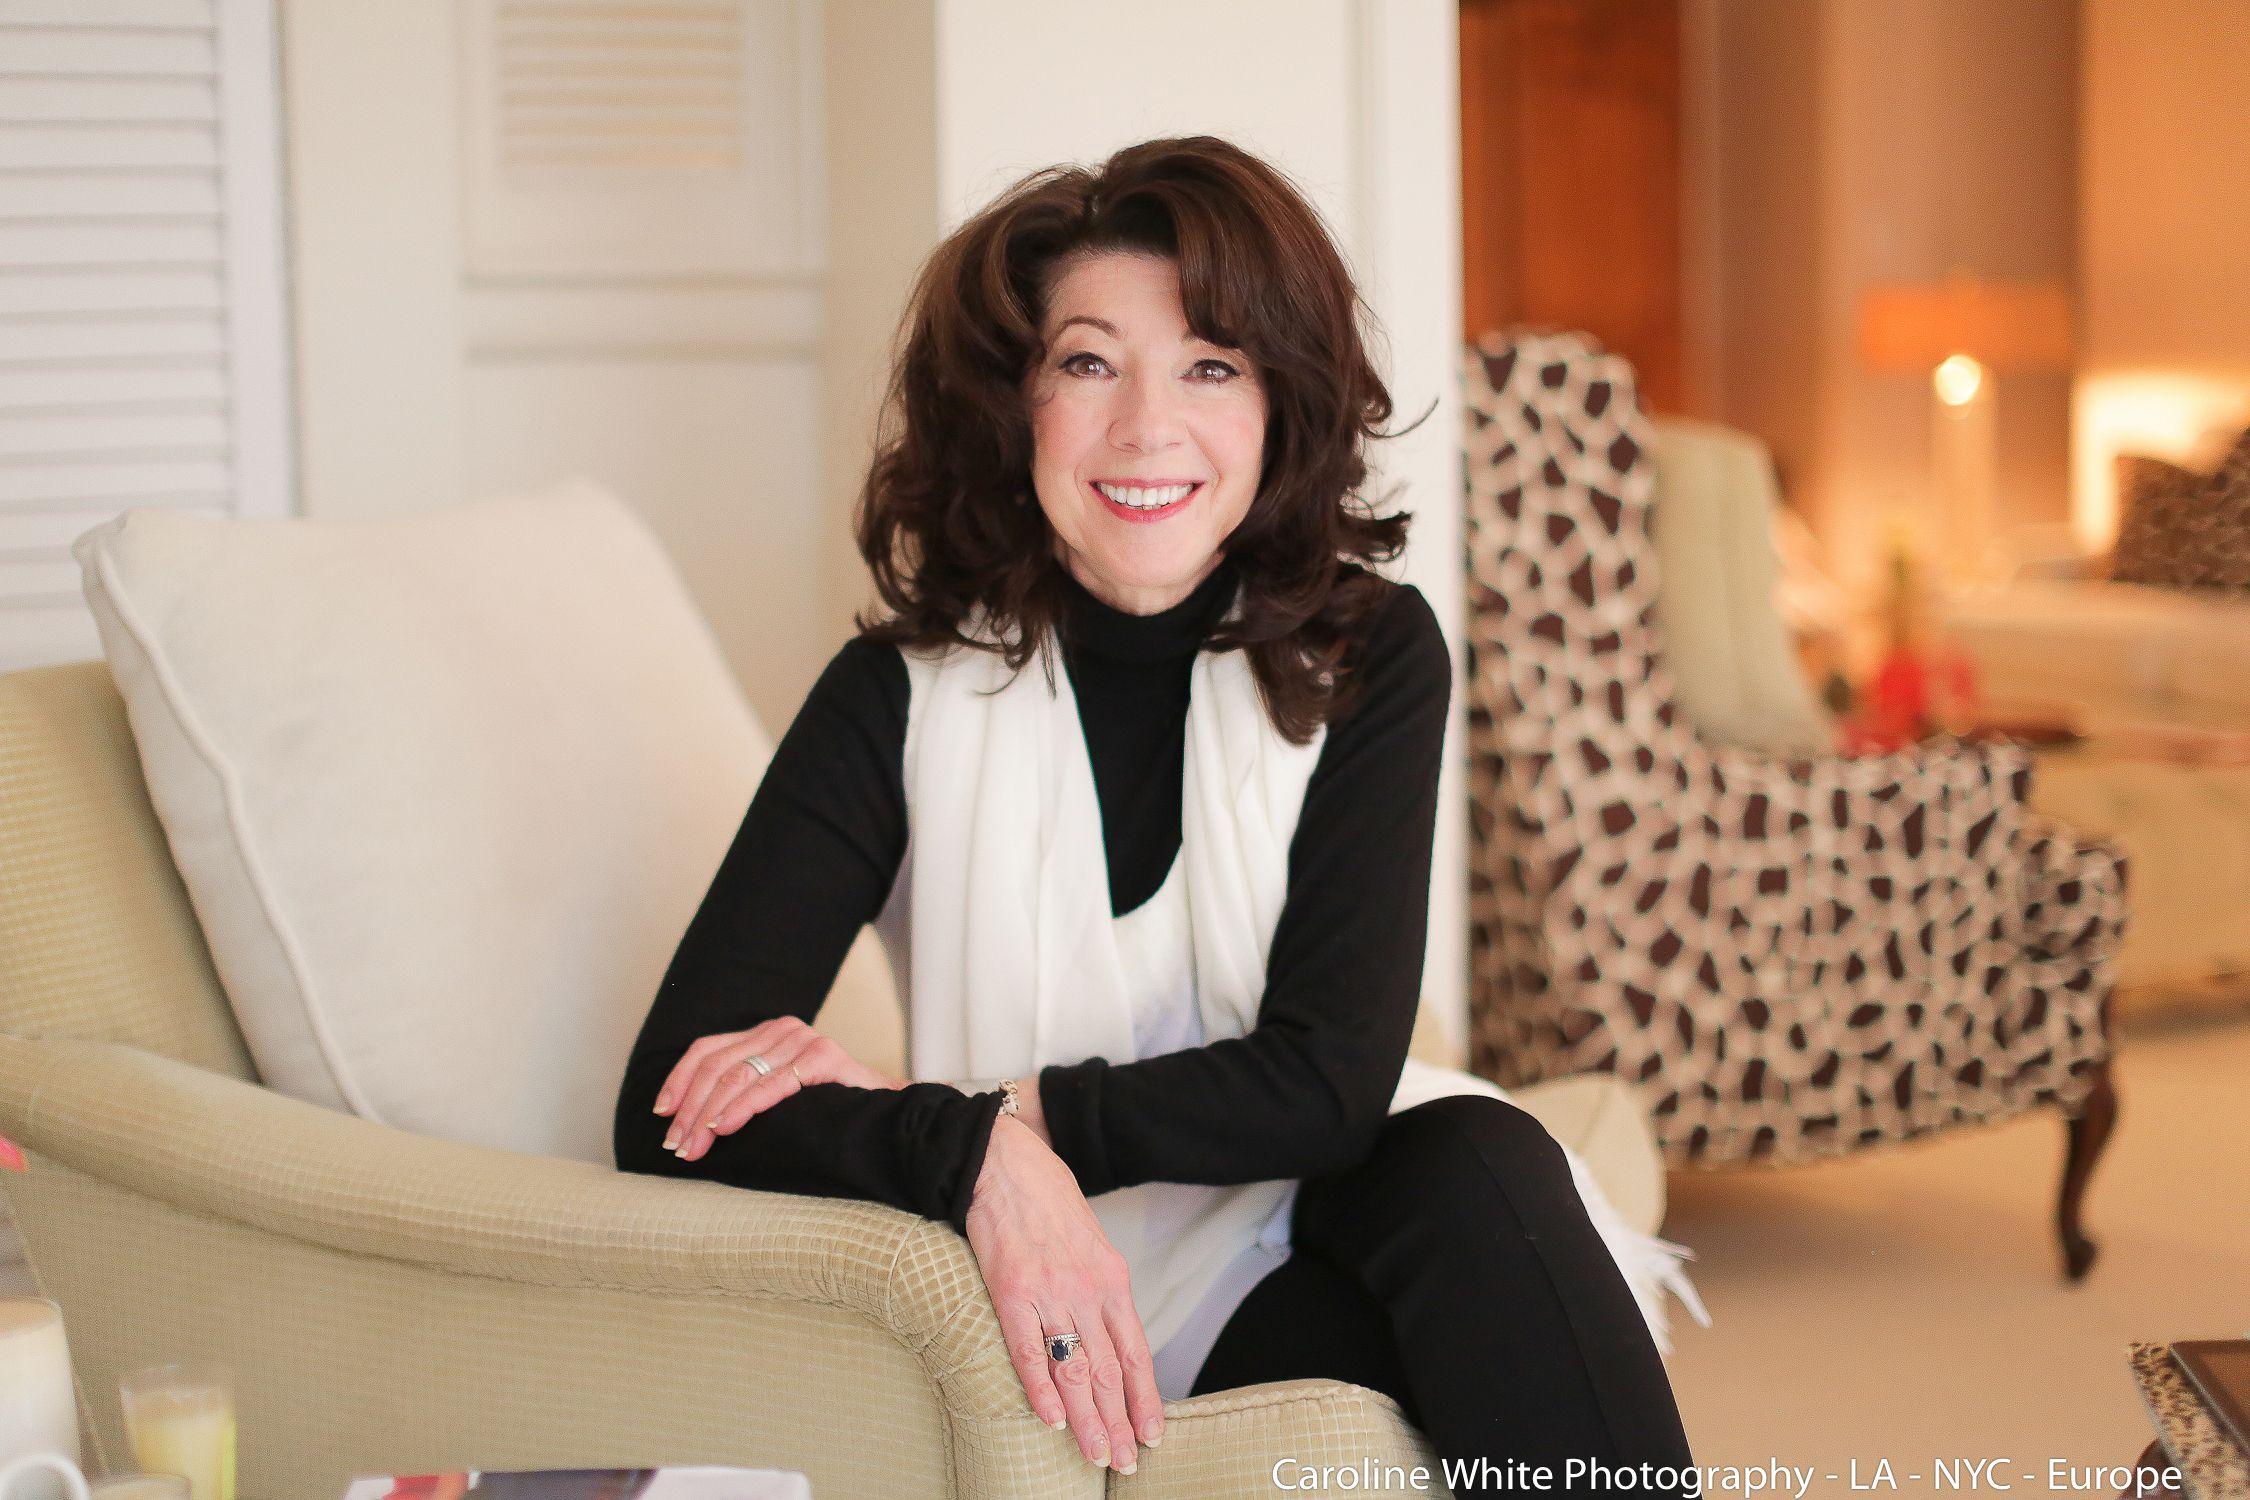 Women Entrepreneurs Personal Branding Lifestyle Photoshoot by